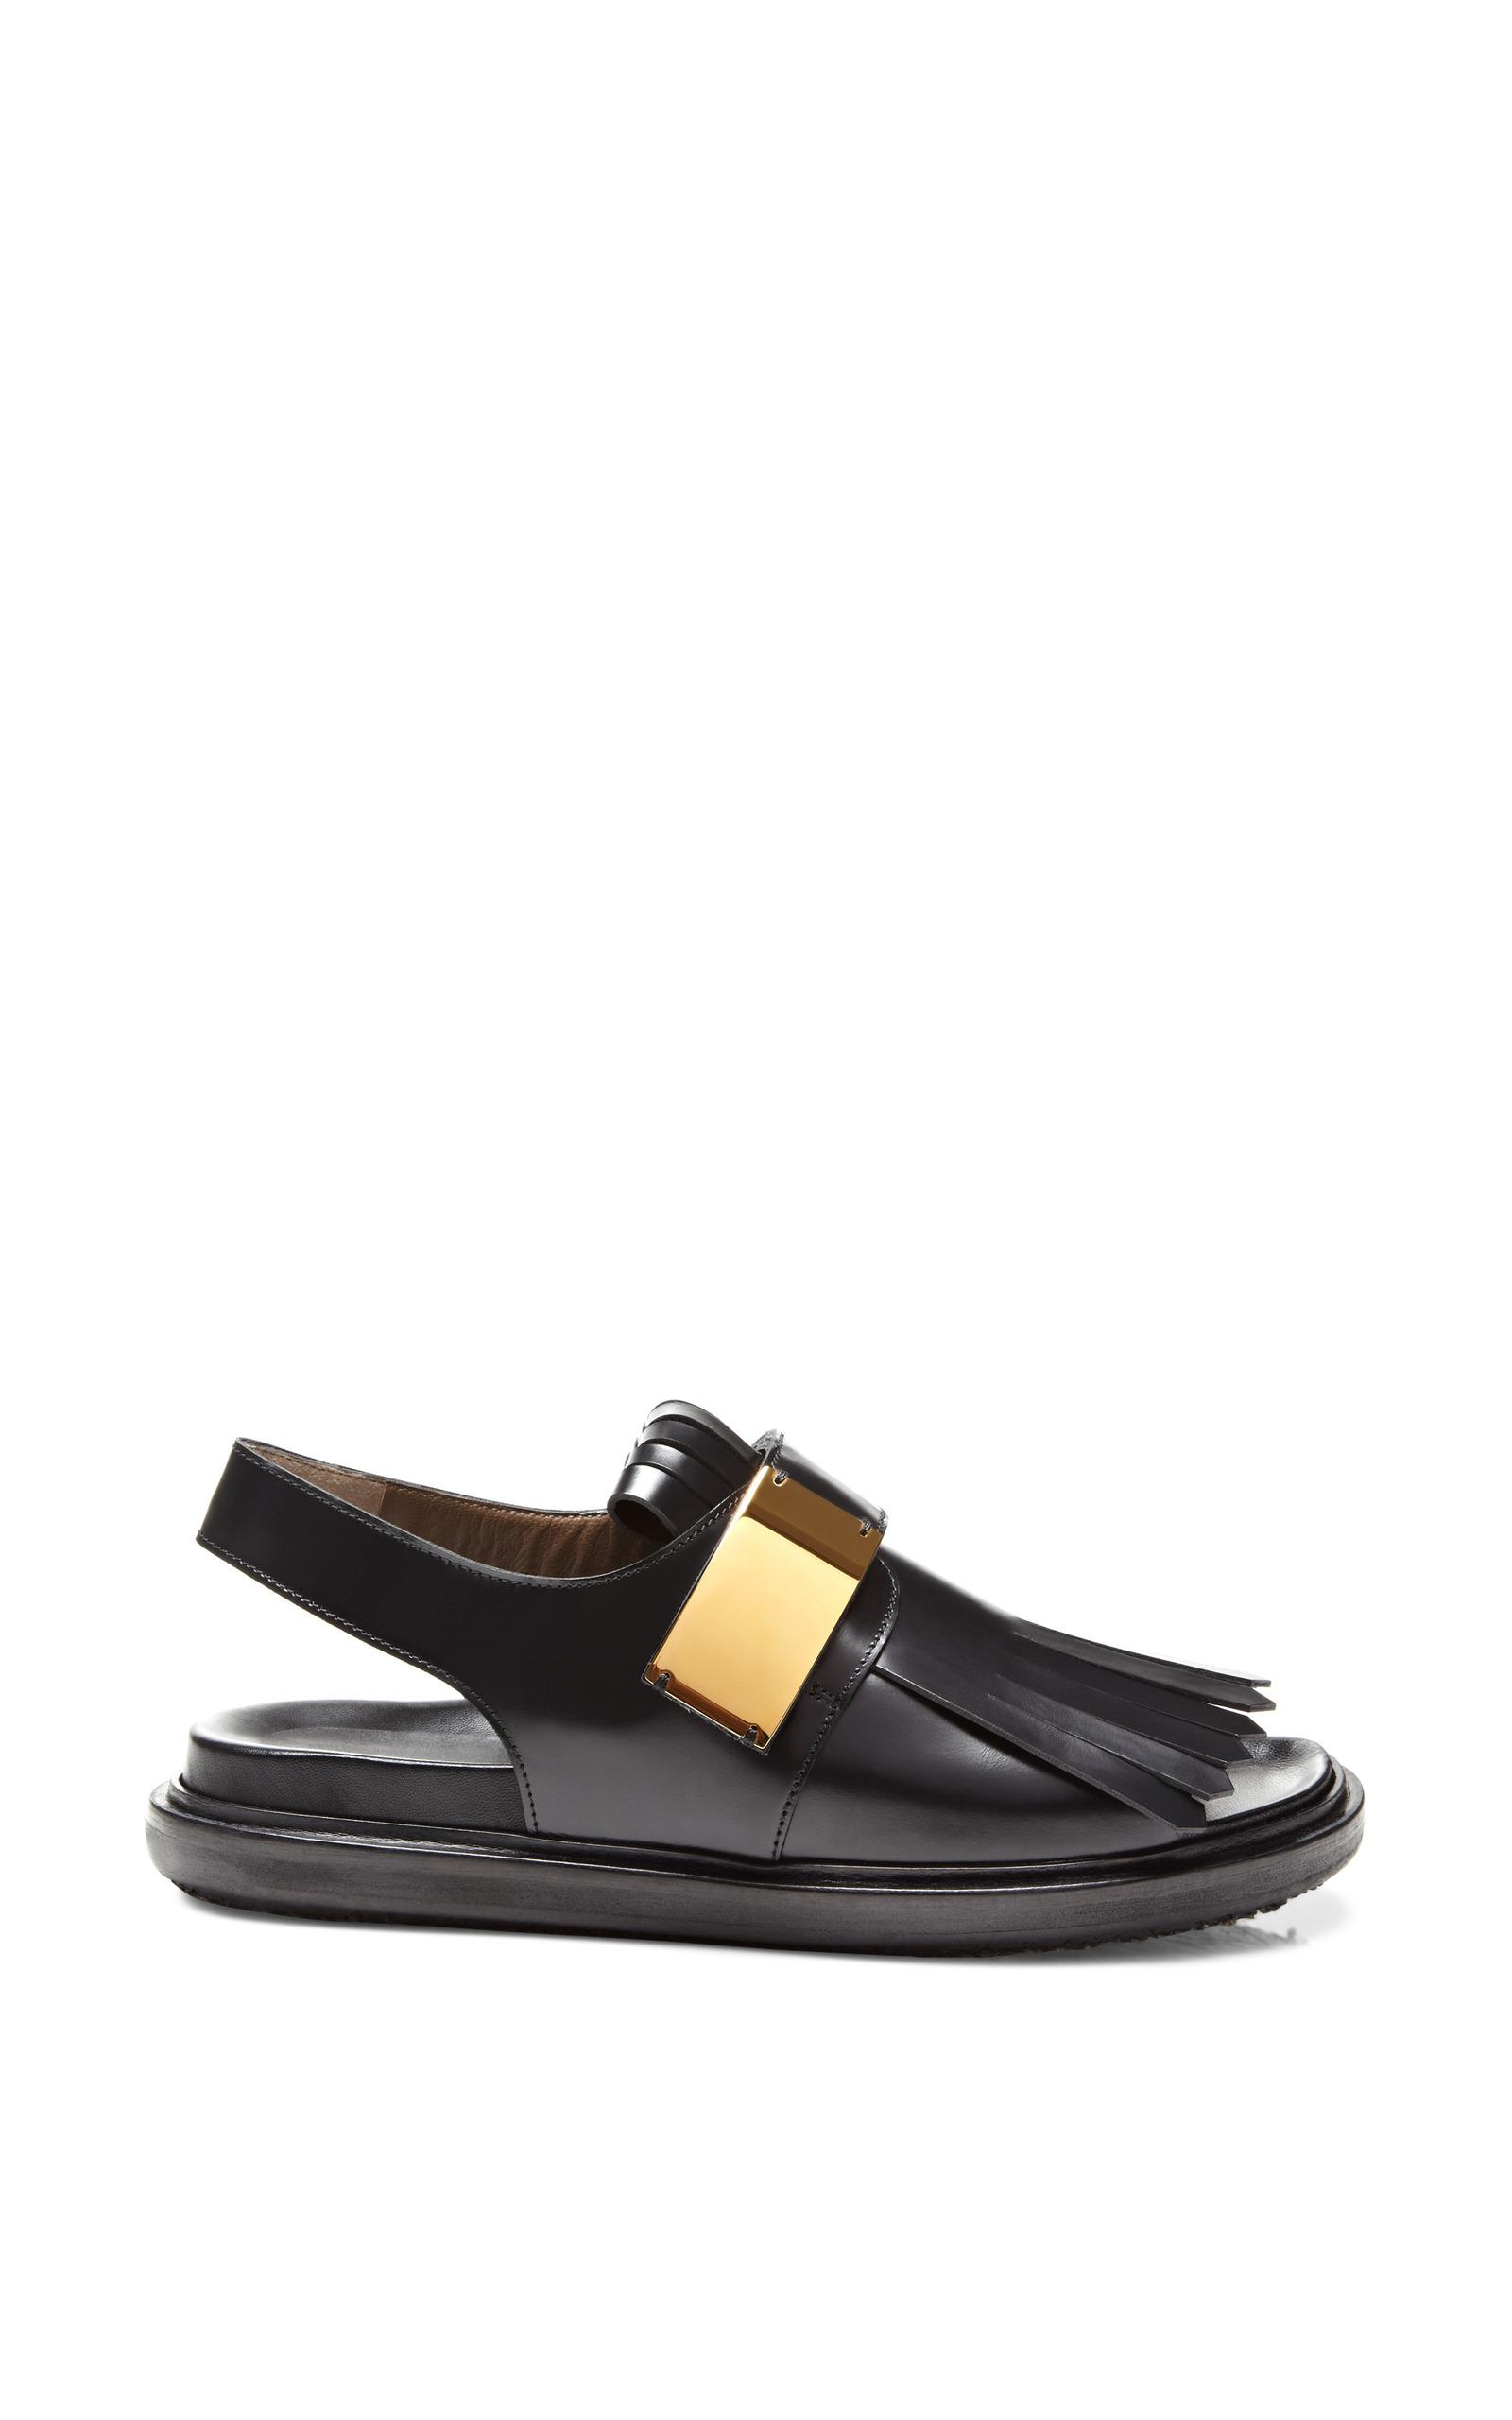 Fringed Leather Sandals By Marni Moda Operandi